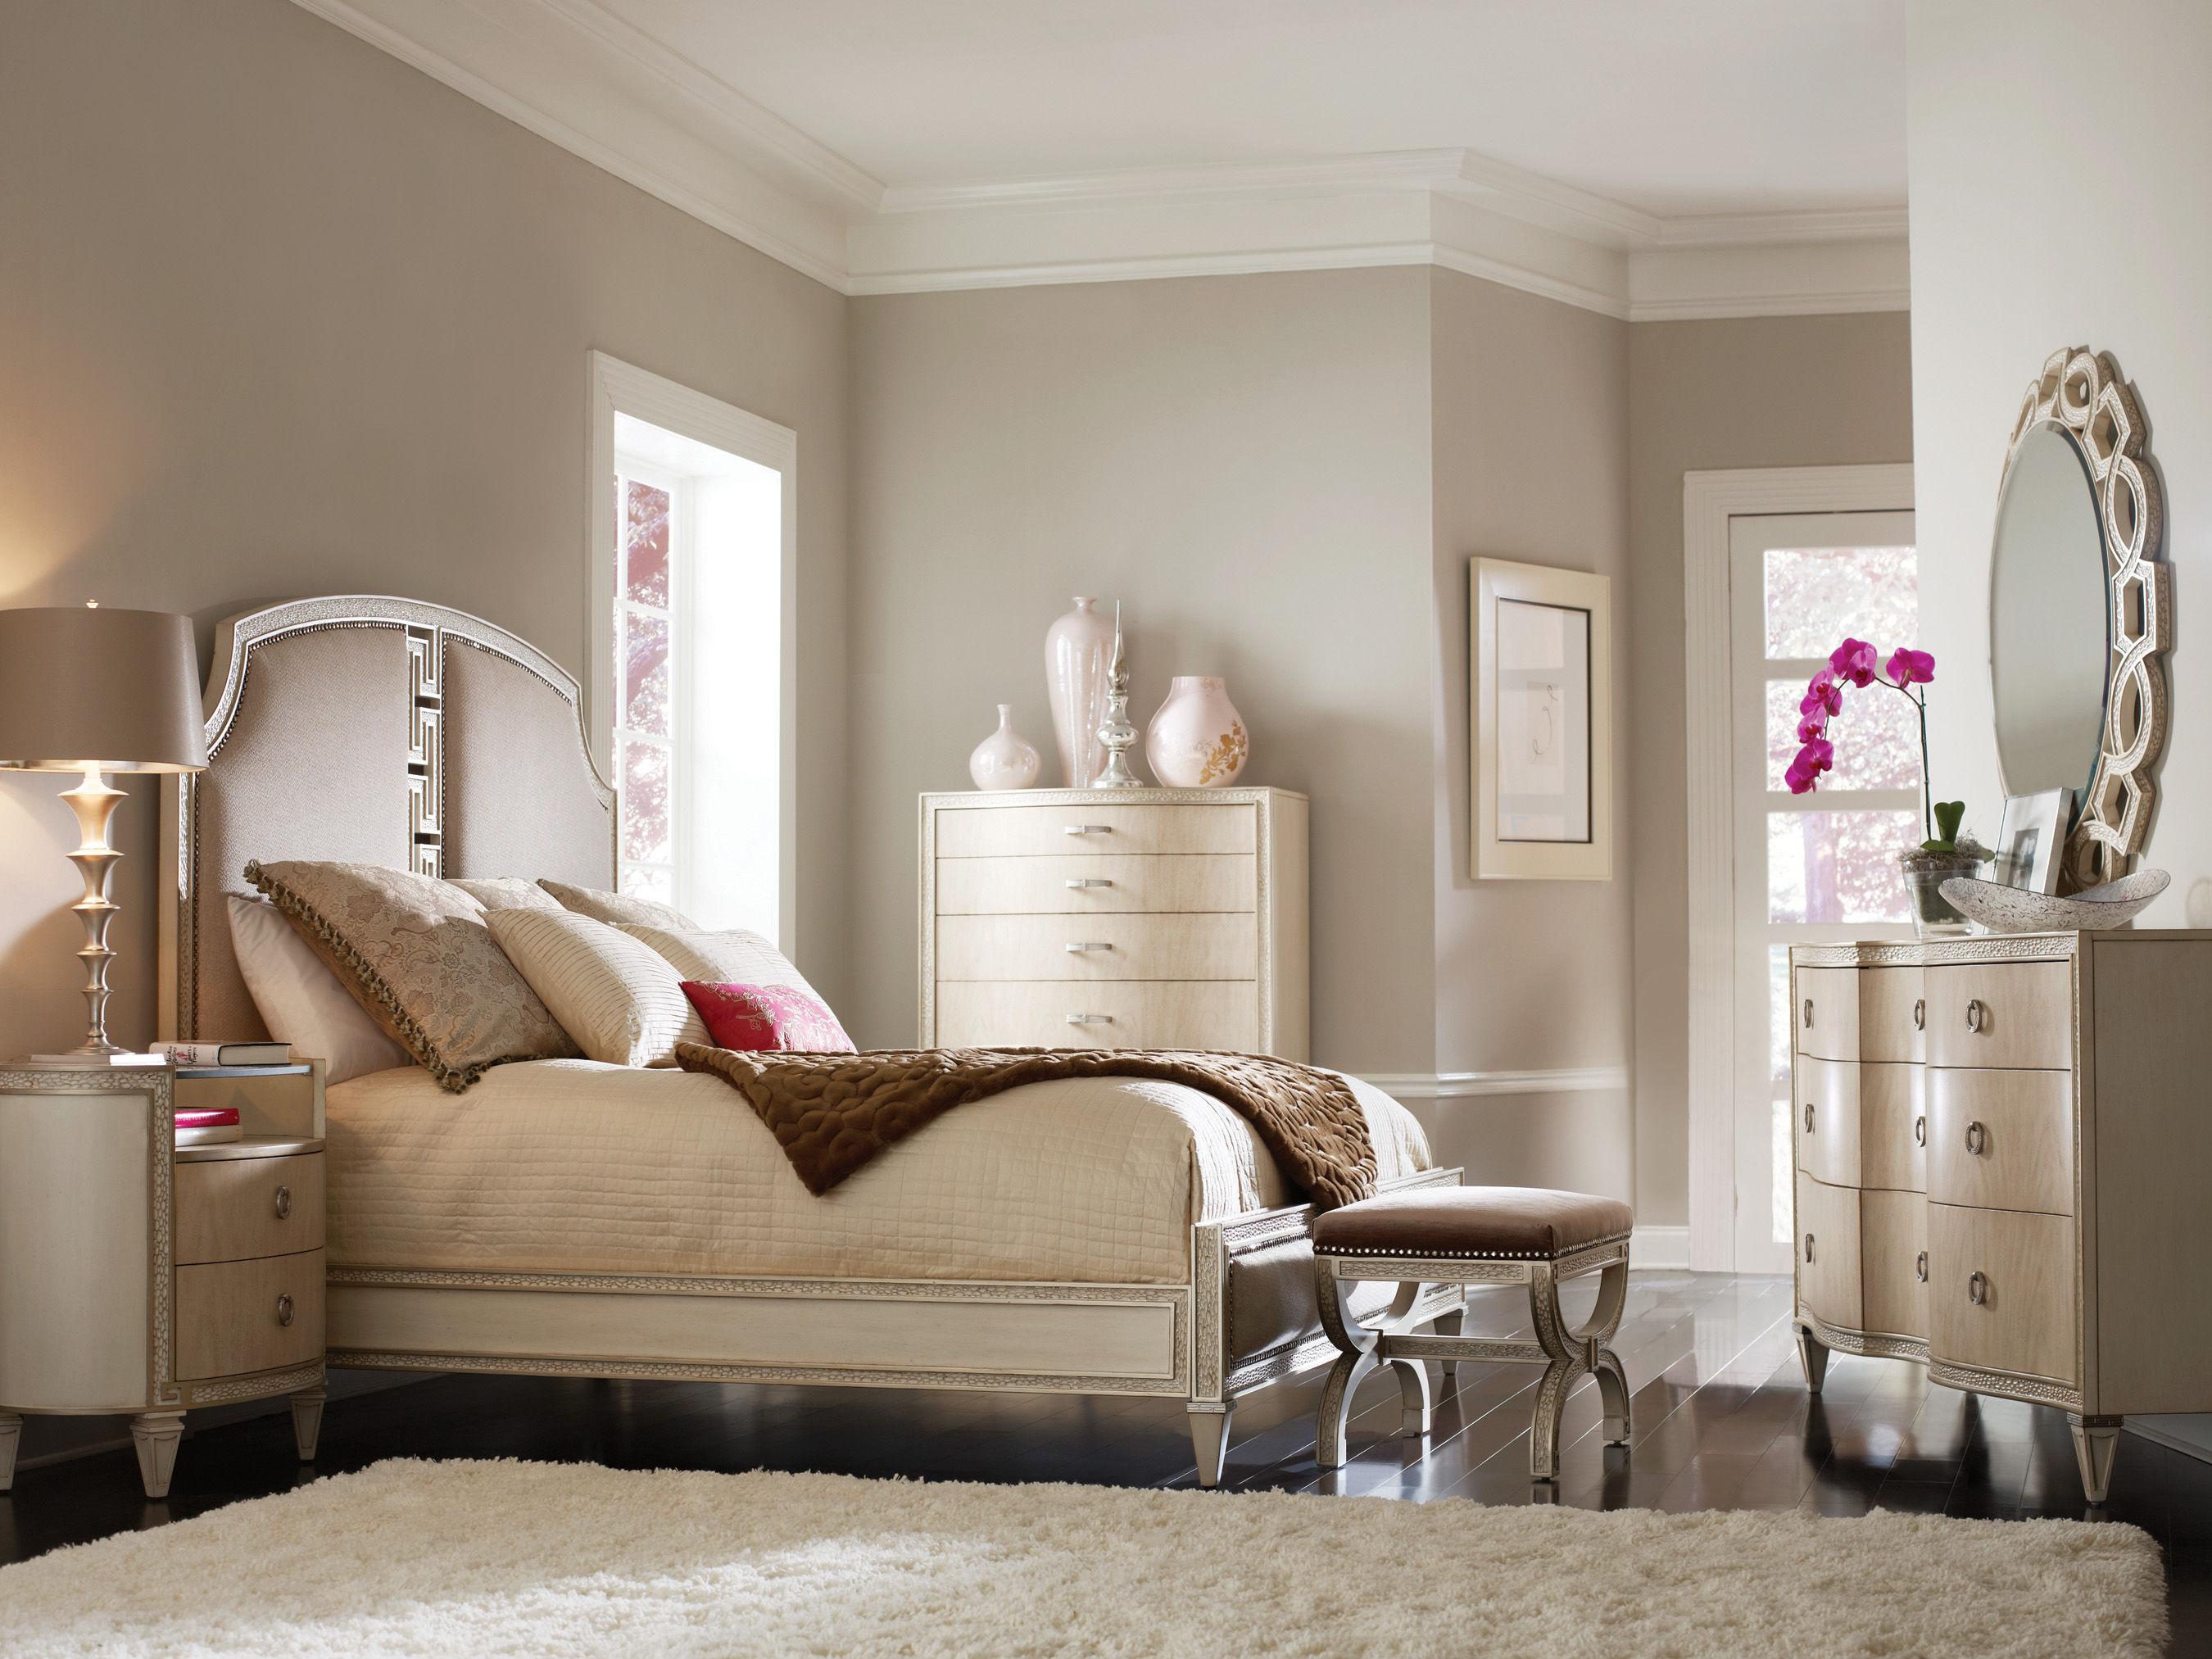 Schnadig Bedroom Furniture Furniture Village Interiors Incline Village At North Lake Tahoe